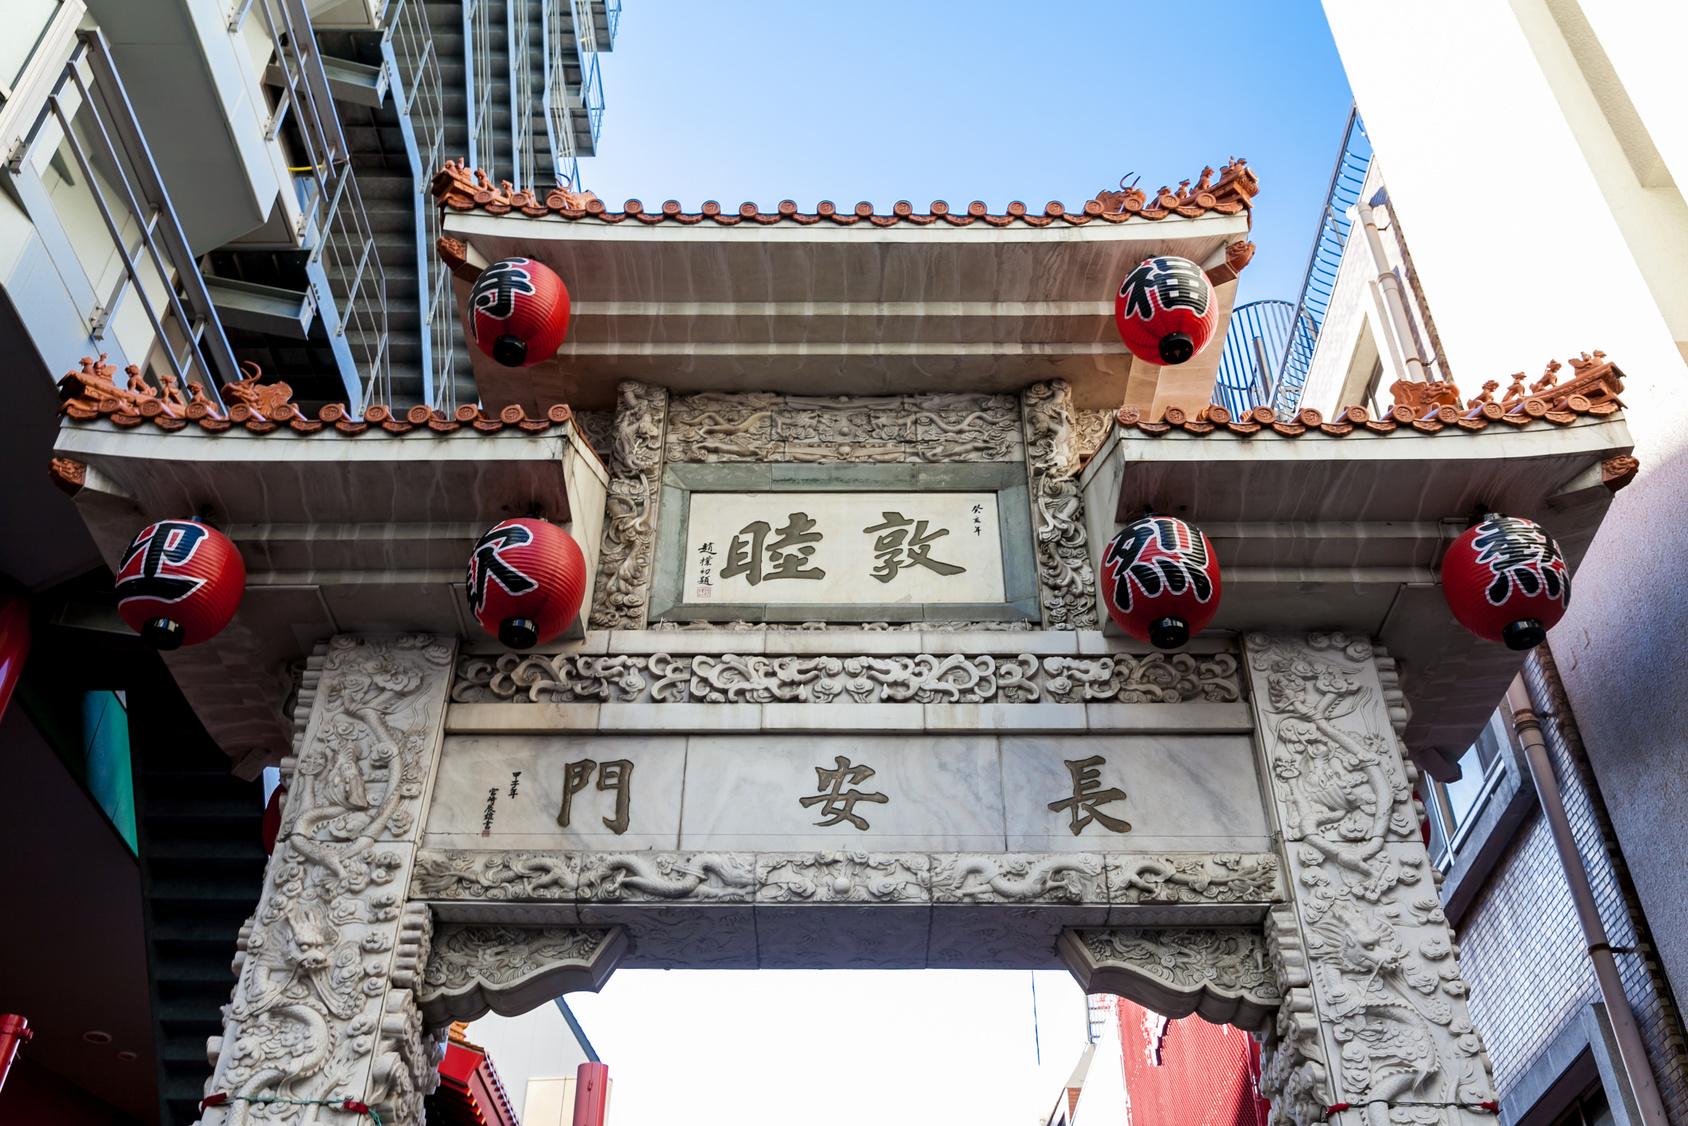 quartier de chinatown à kobe